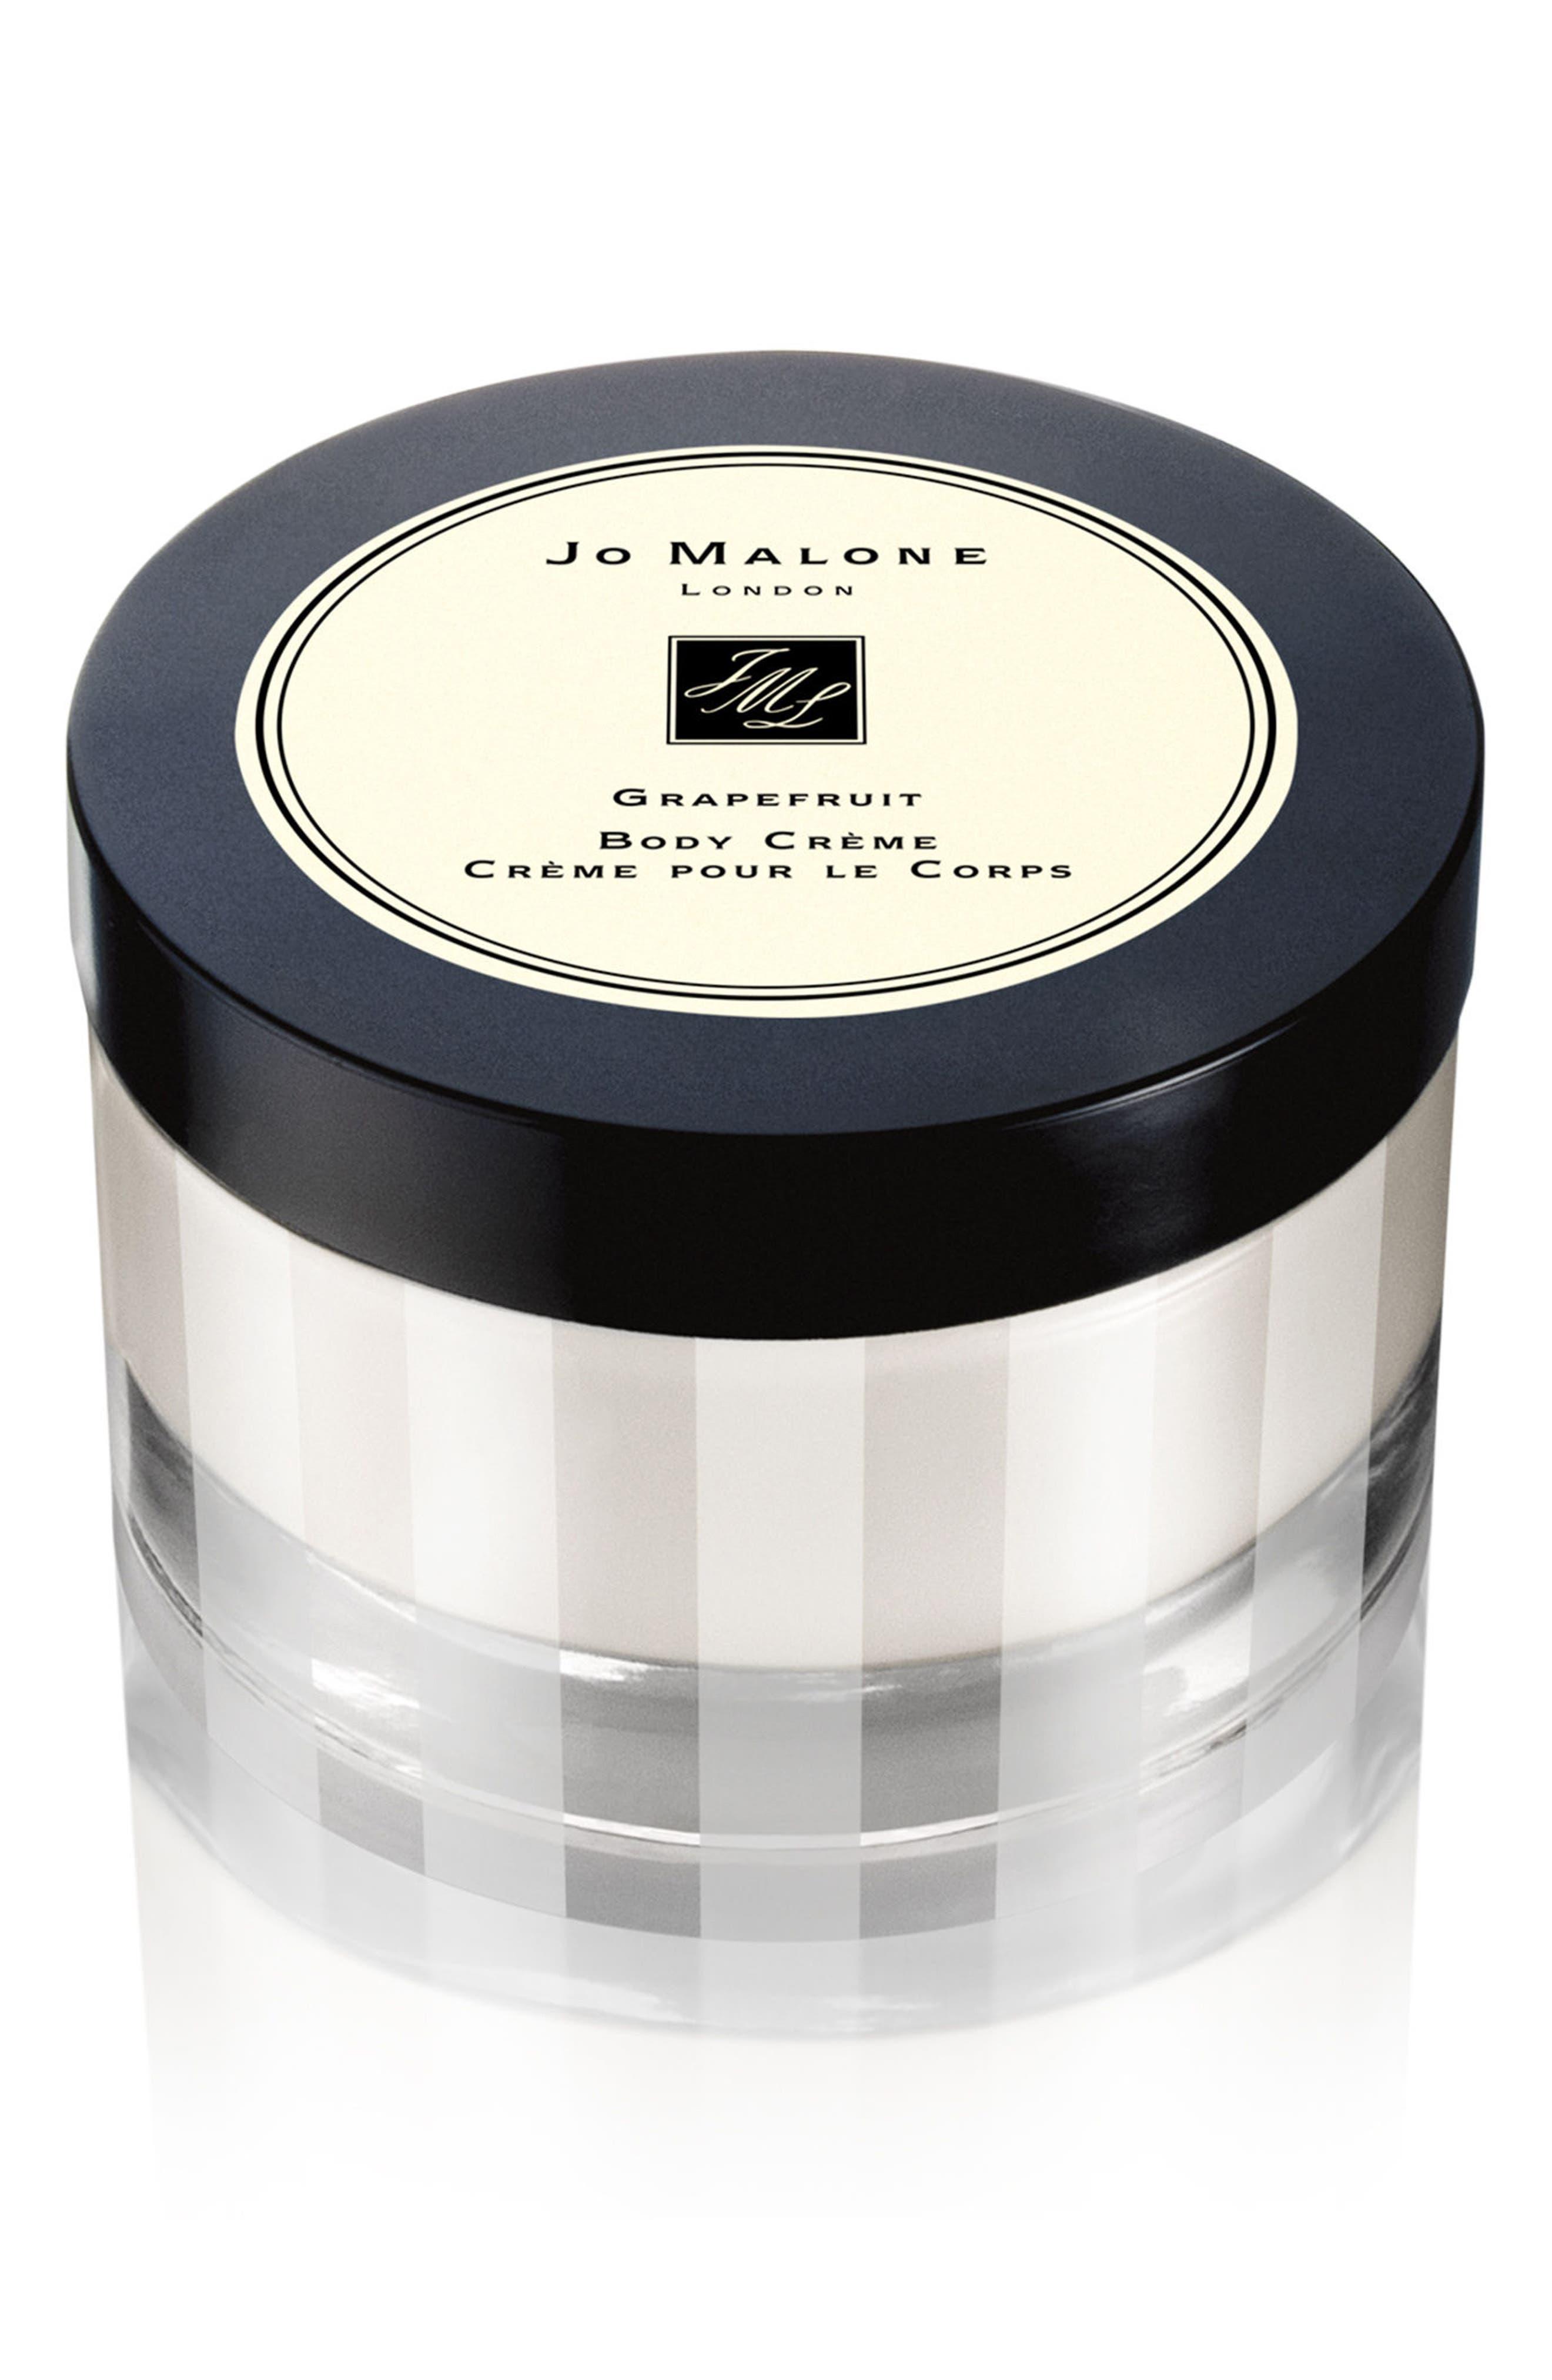 Jo Malone London(TM) Grapefruit Body Creme